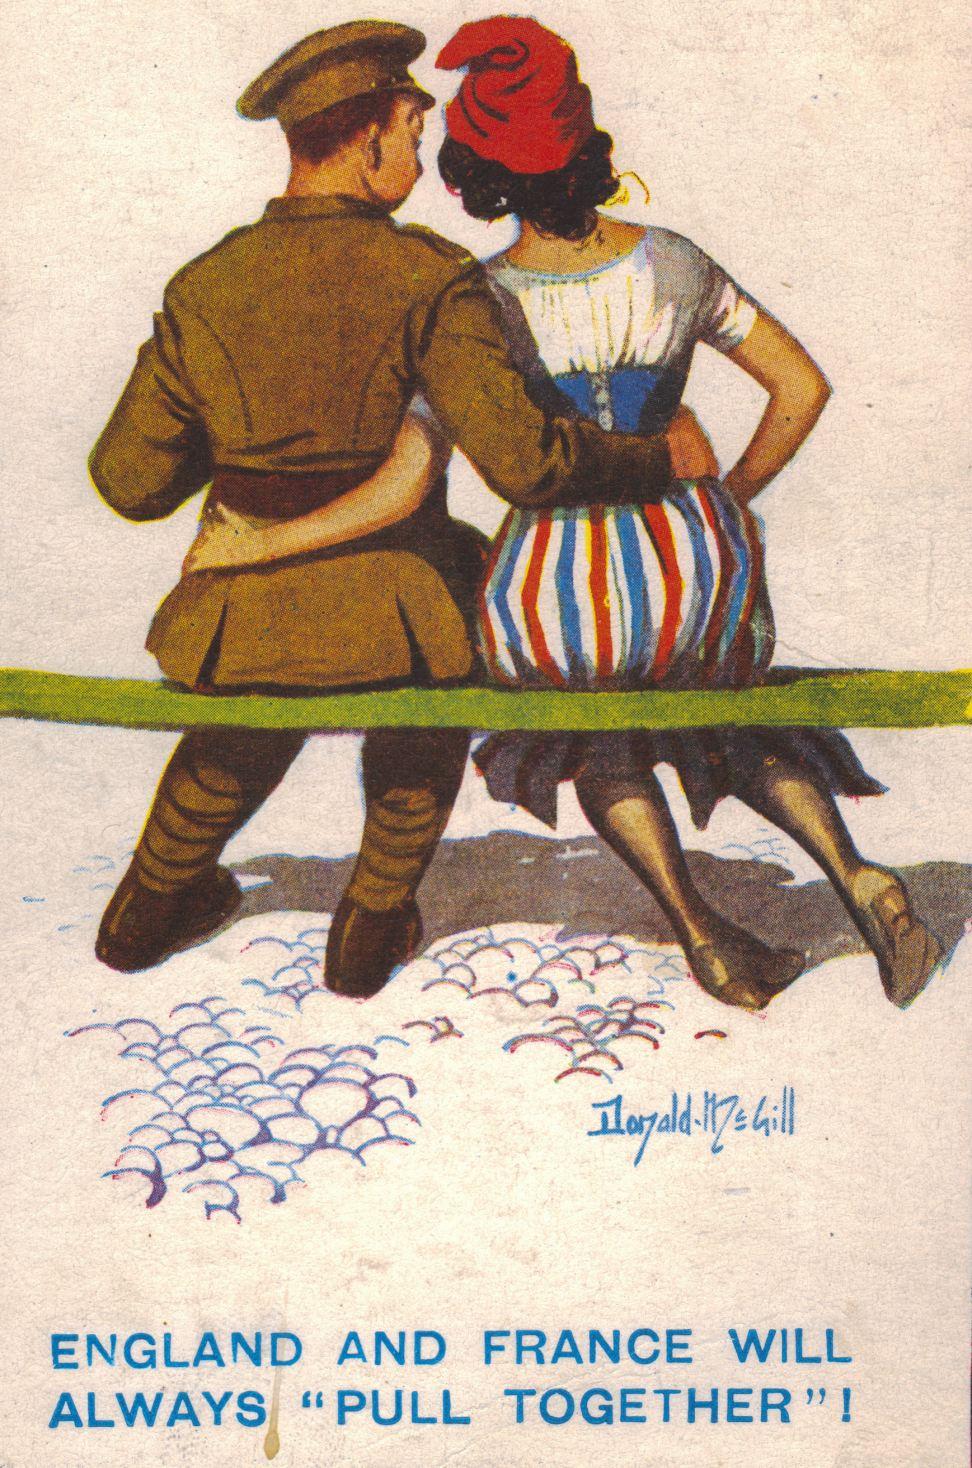 Коллекция открыток Дональда МакГилла (1).jpg